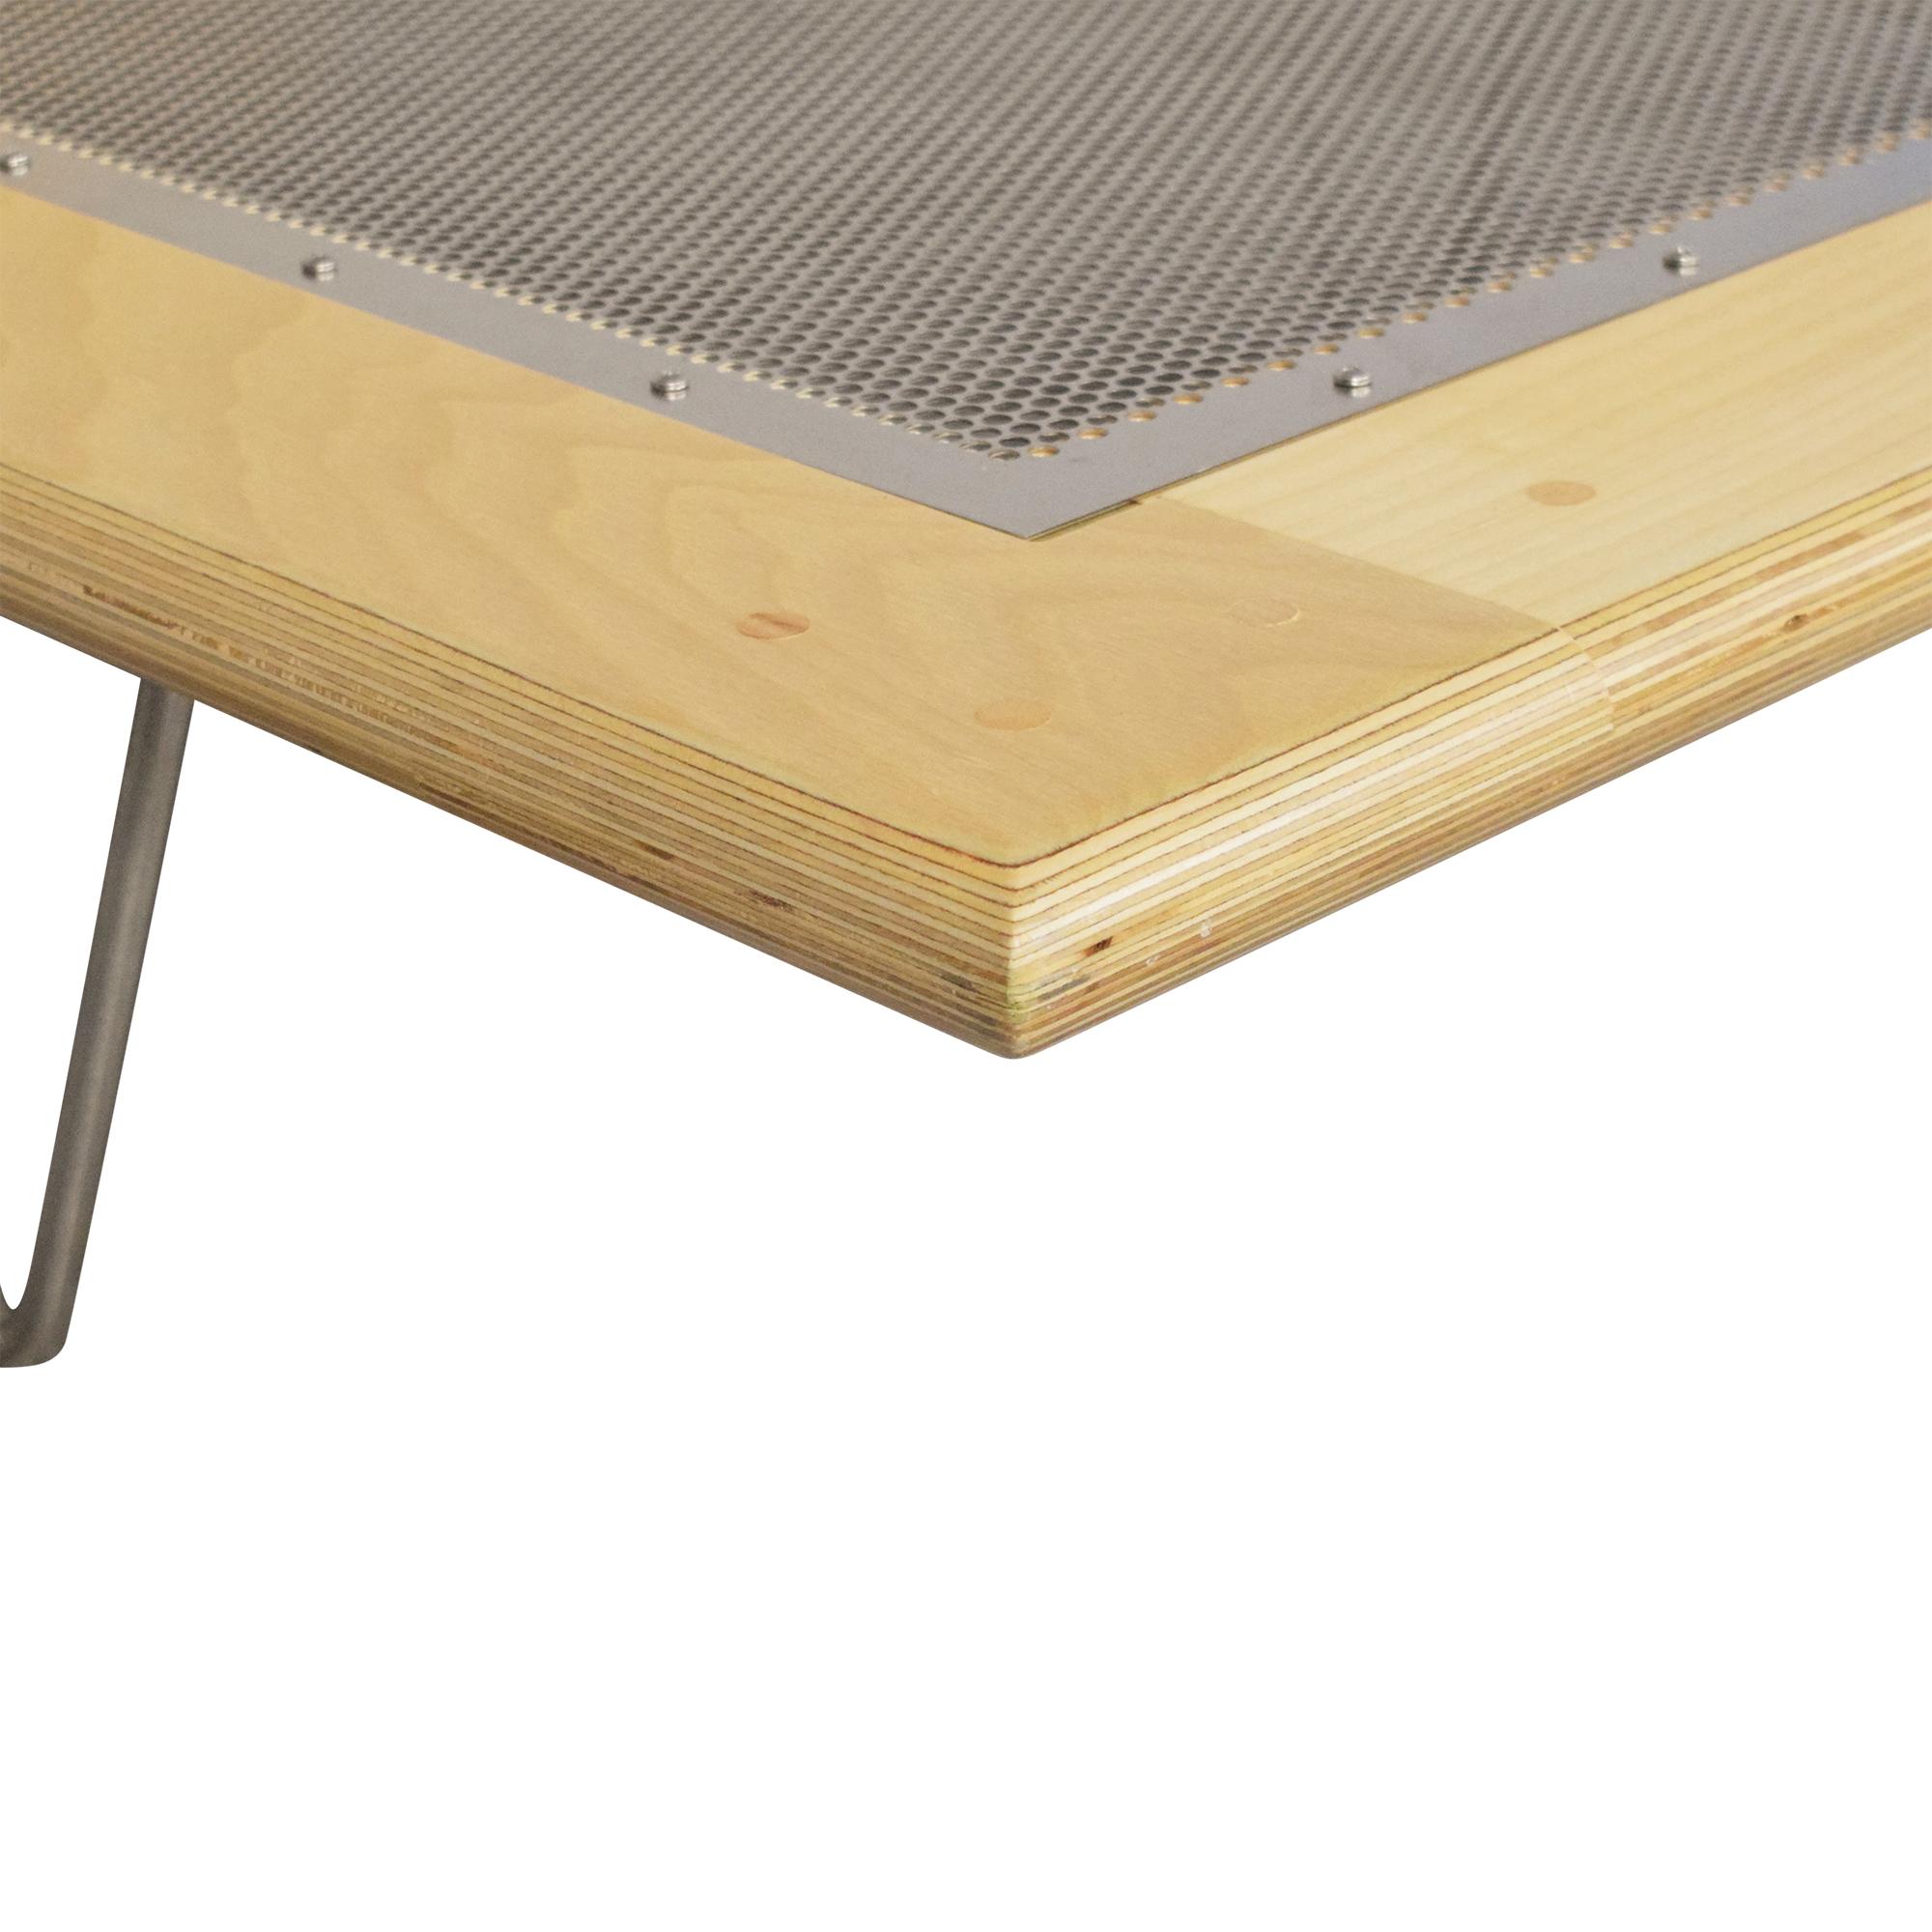 Modernica Modernica Case Study Furniture V Leg Full Bed discount